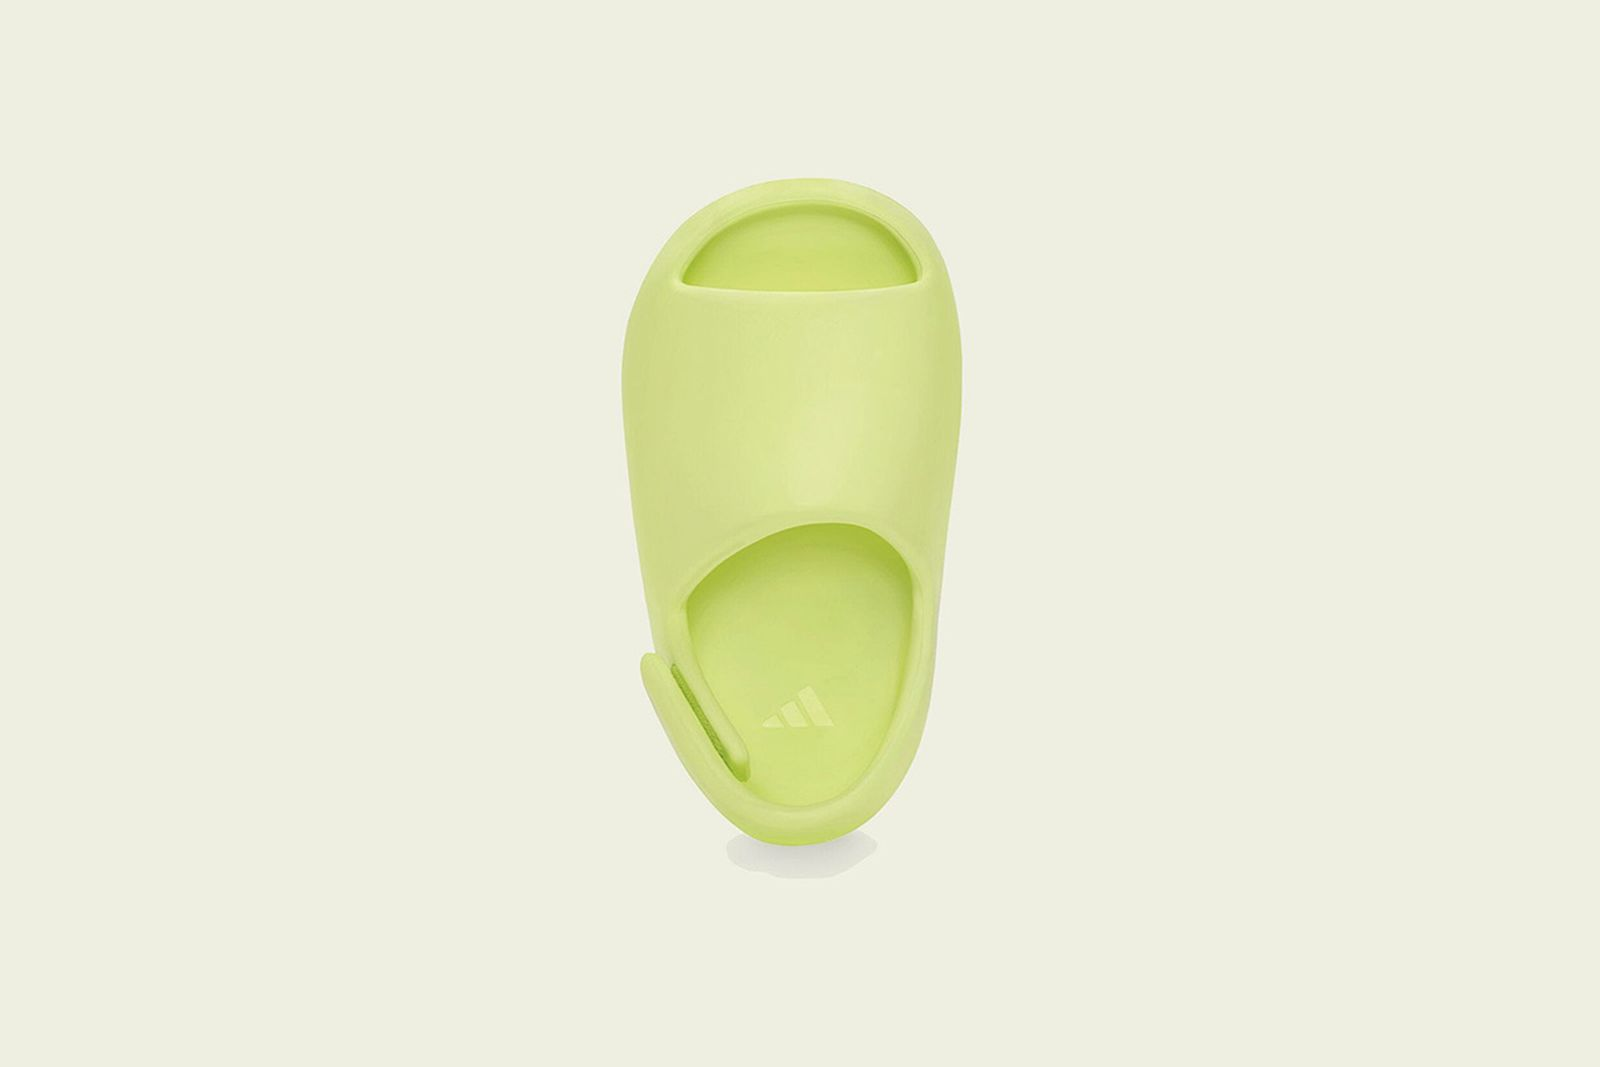 adidas-yeezy-slide-green-glow-release-date-info-price-08